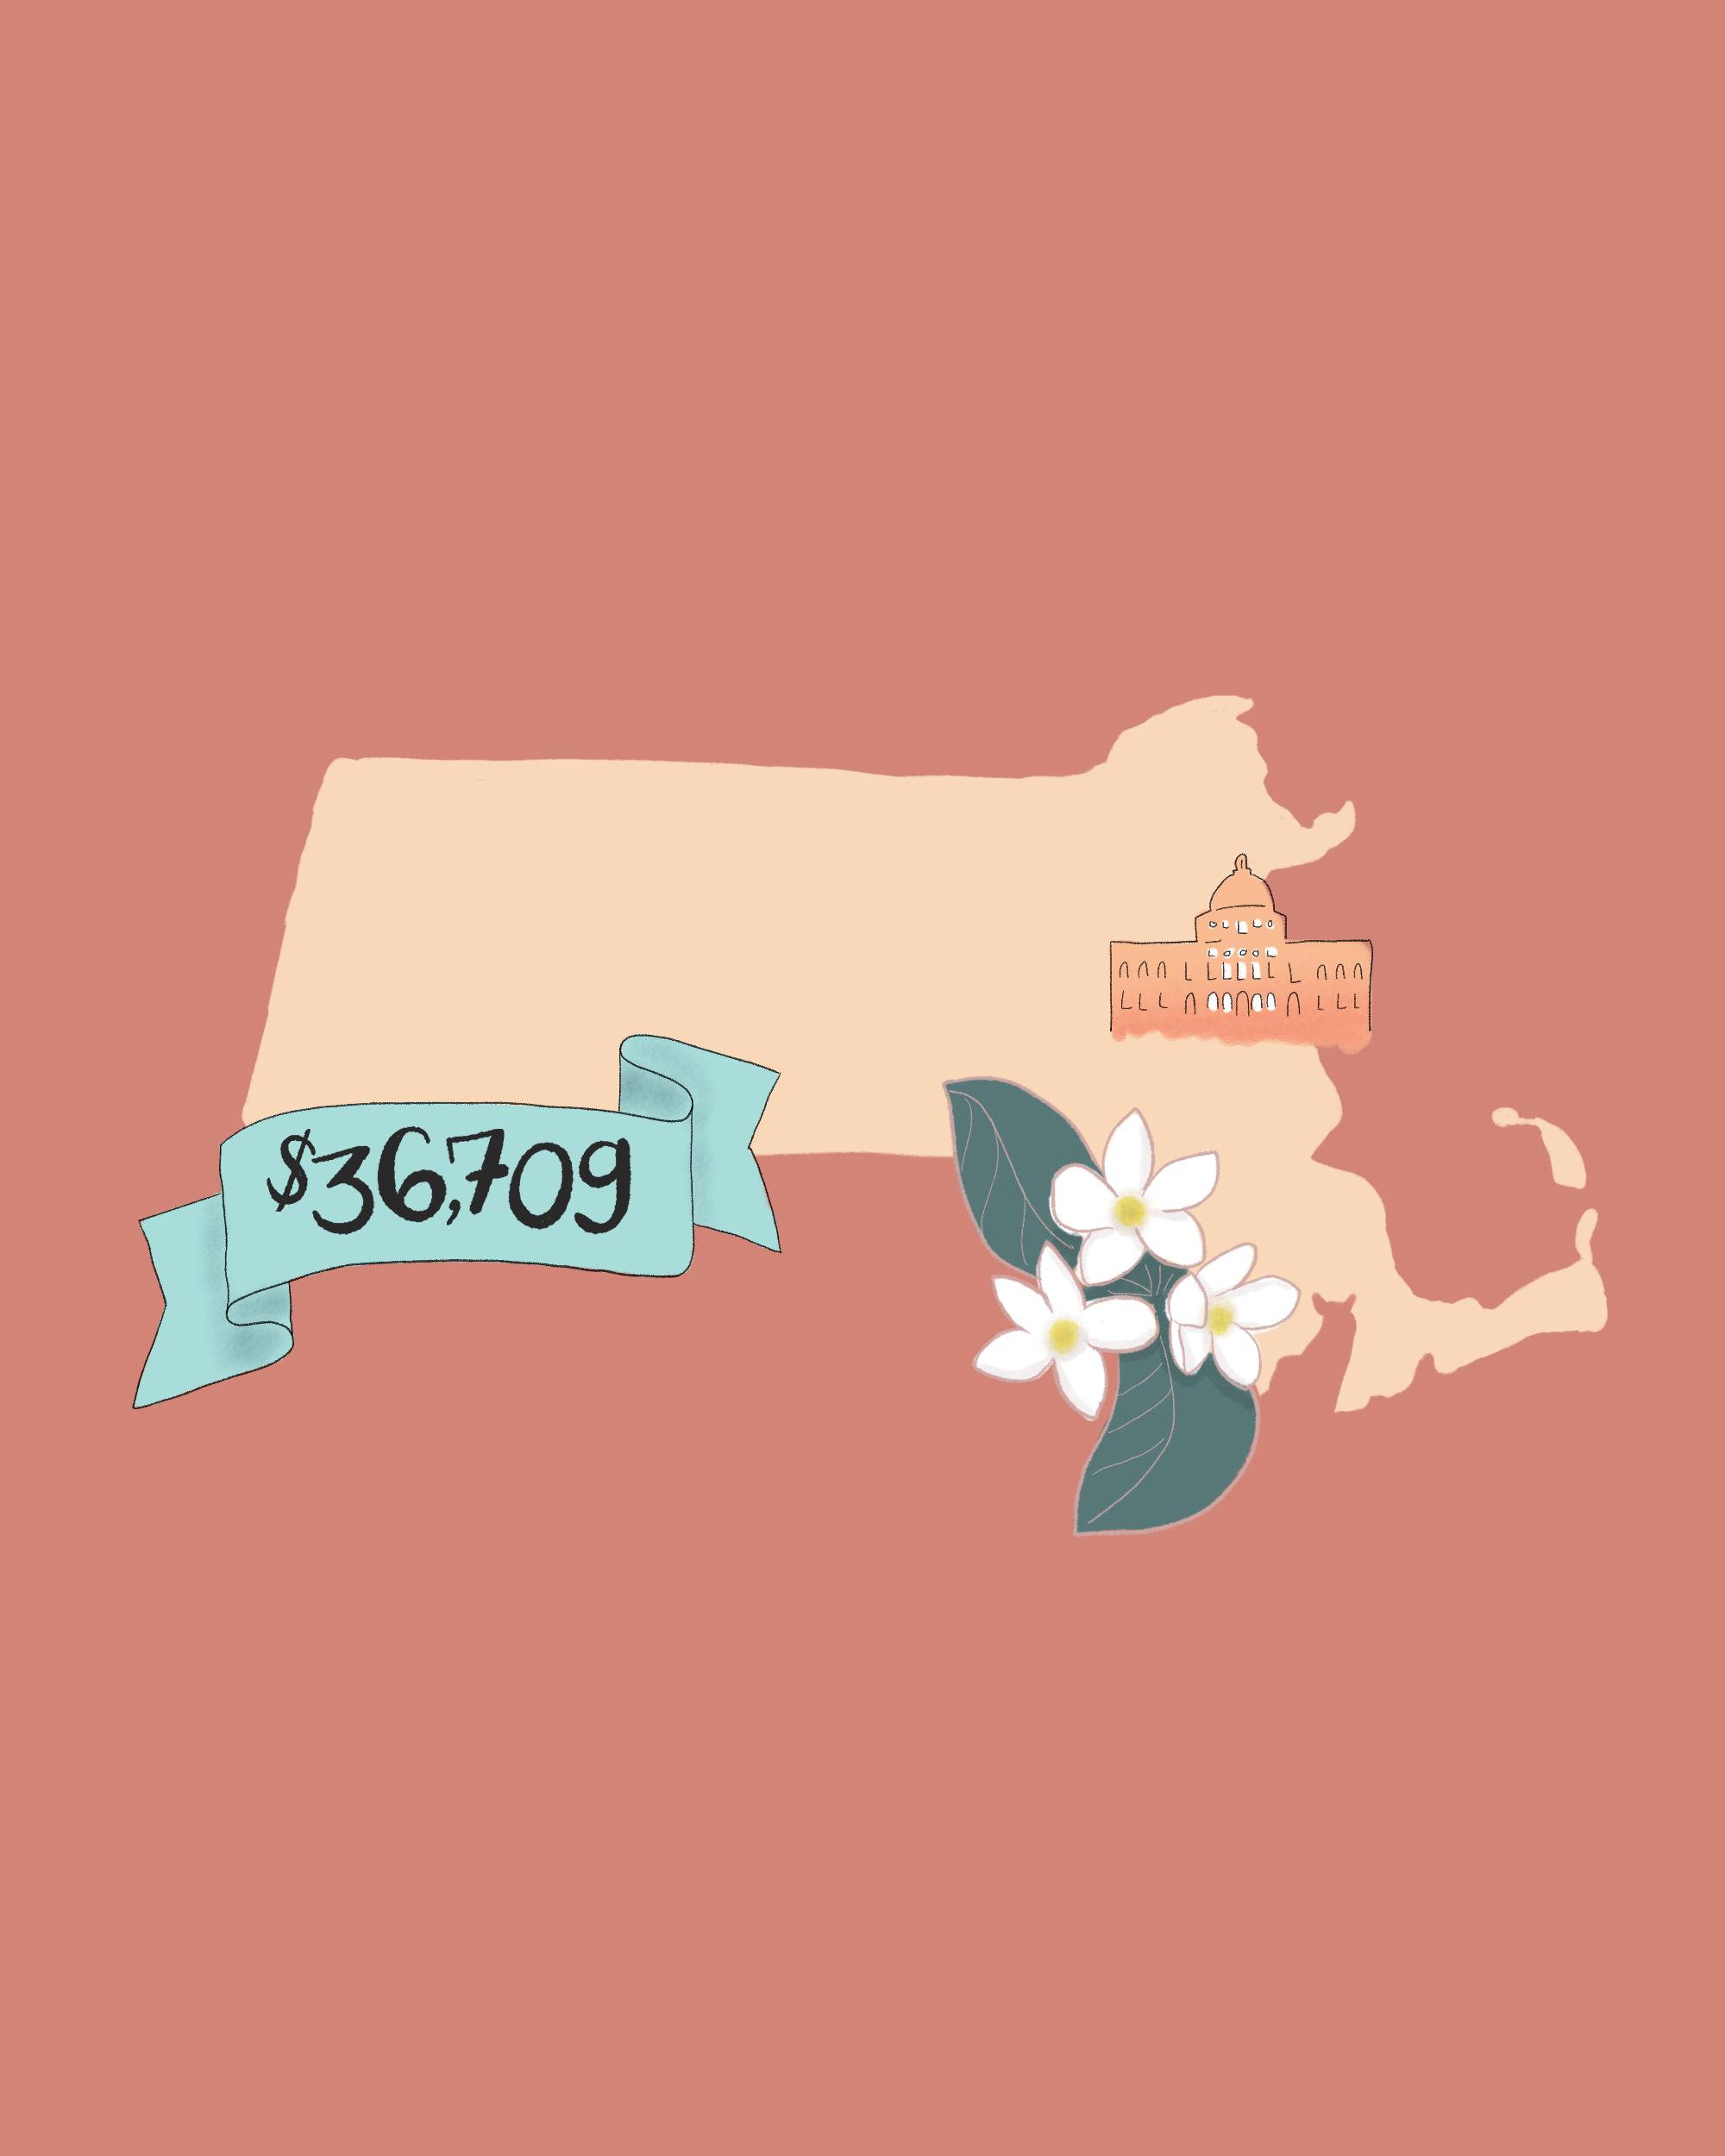 state wedding costs illustration massachusetts